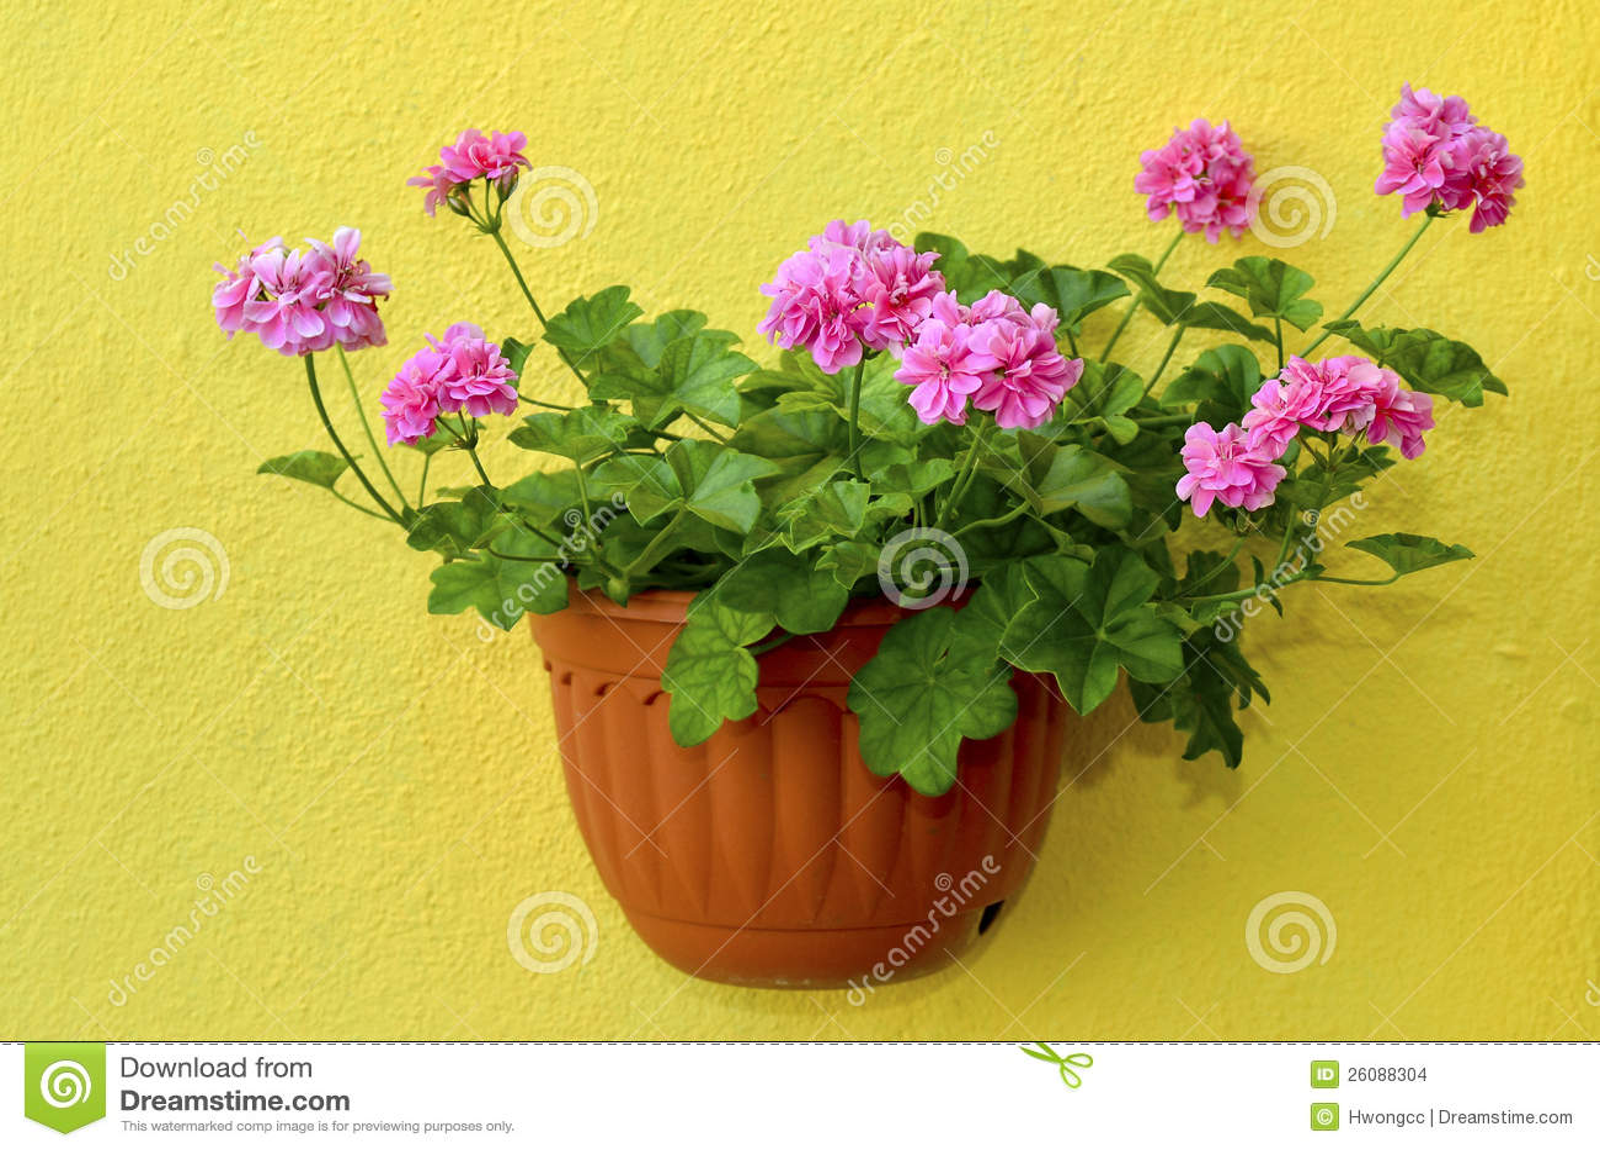 Trailing Ivy Geranium Flower Planter Stock Image Image Of Tree